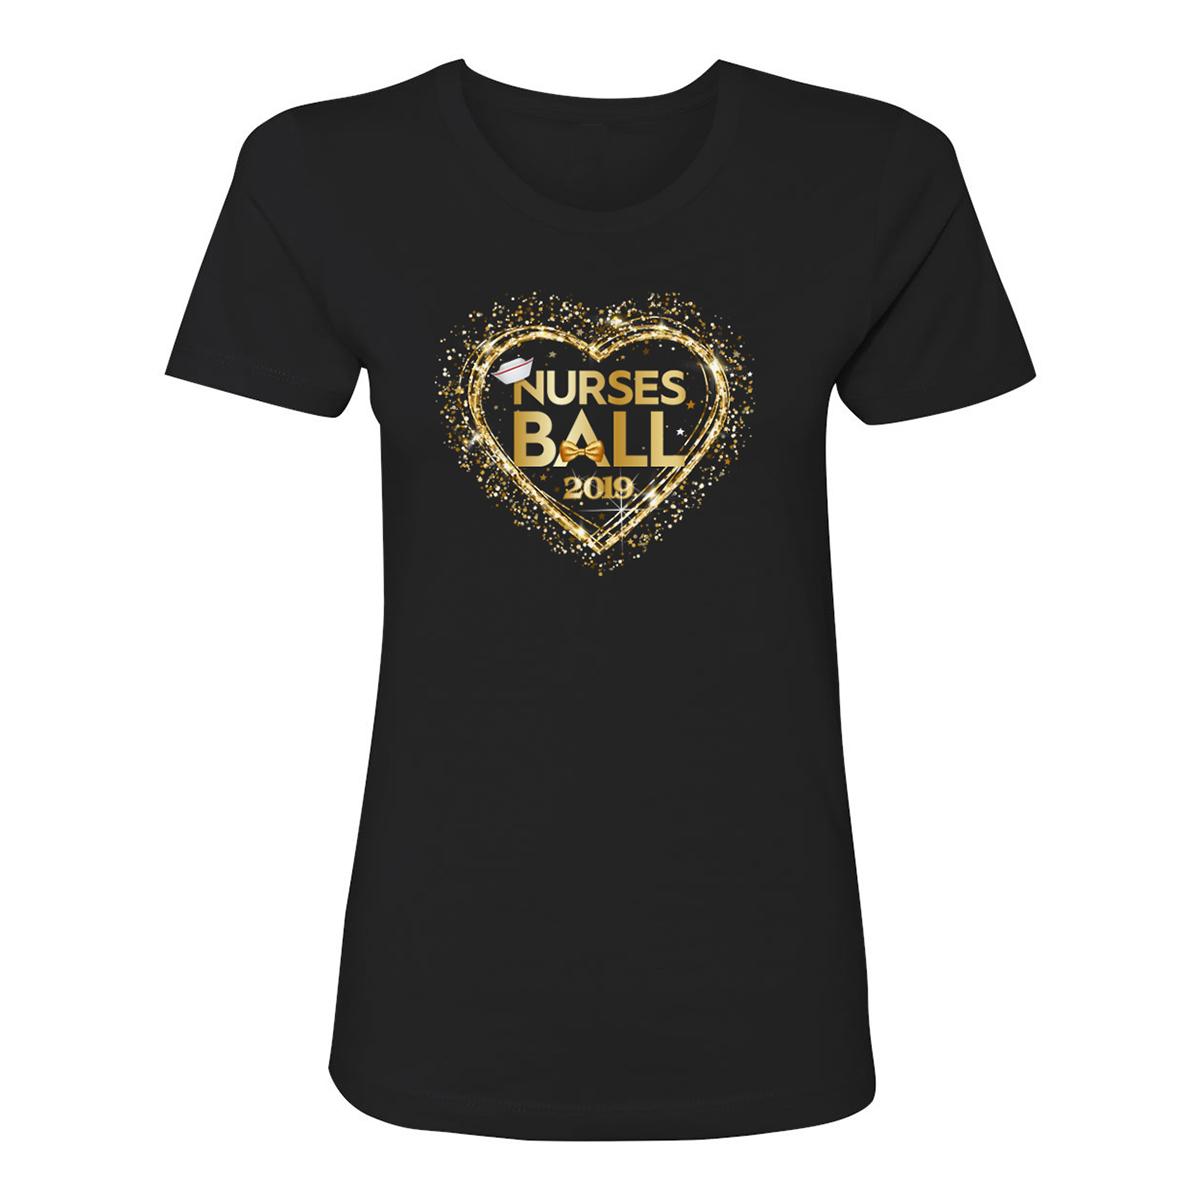 General Hospital Nurses Ball Women's T-Shirt